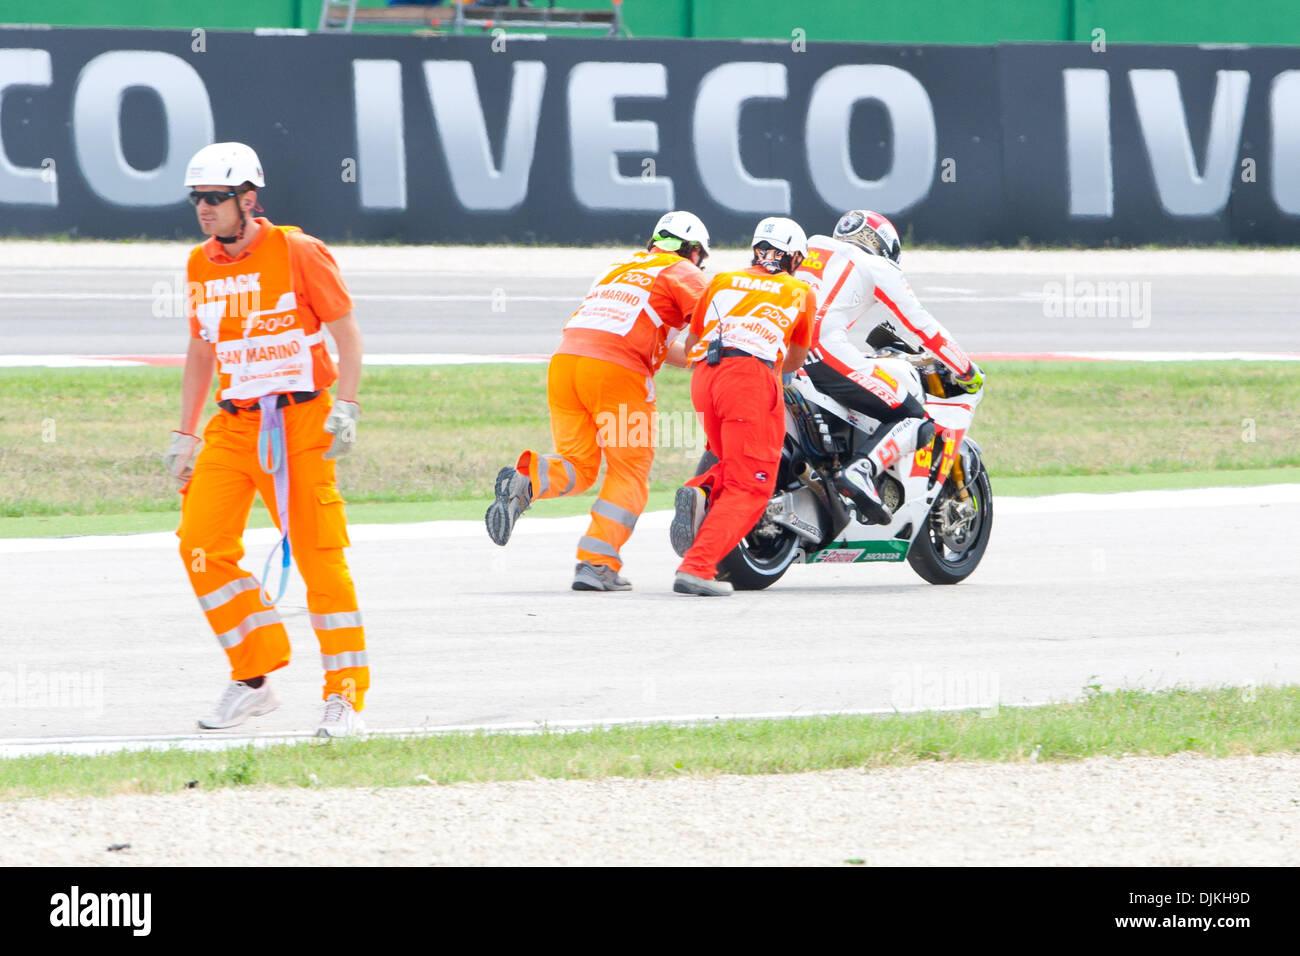 Sep. 07, 2010 - Misano Adriatico, Italy - Honda Gresini  rider Marco Simoncelli (ITA #58) after a crash during the San Marino GP in Misano Adriatico, Italy. (Credit Image: © Andrea Ranalli/Southcreek Global/ZUMApress.com) - Stock Image